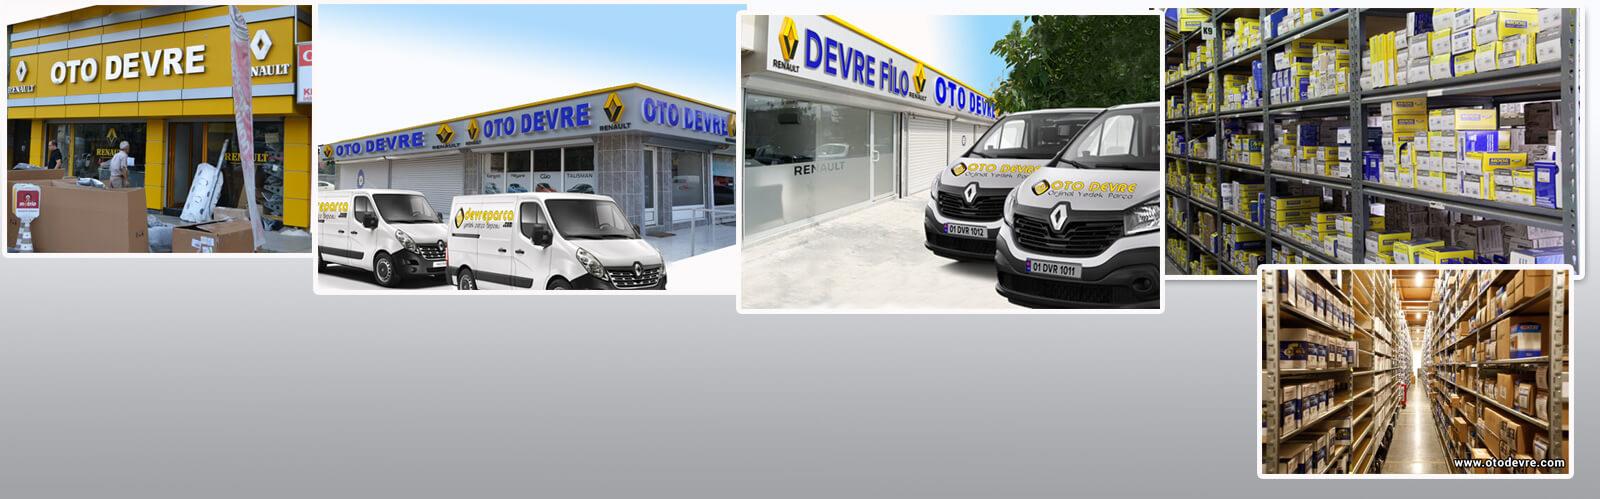 Renault -Dacia Yedek Parça deposu